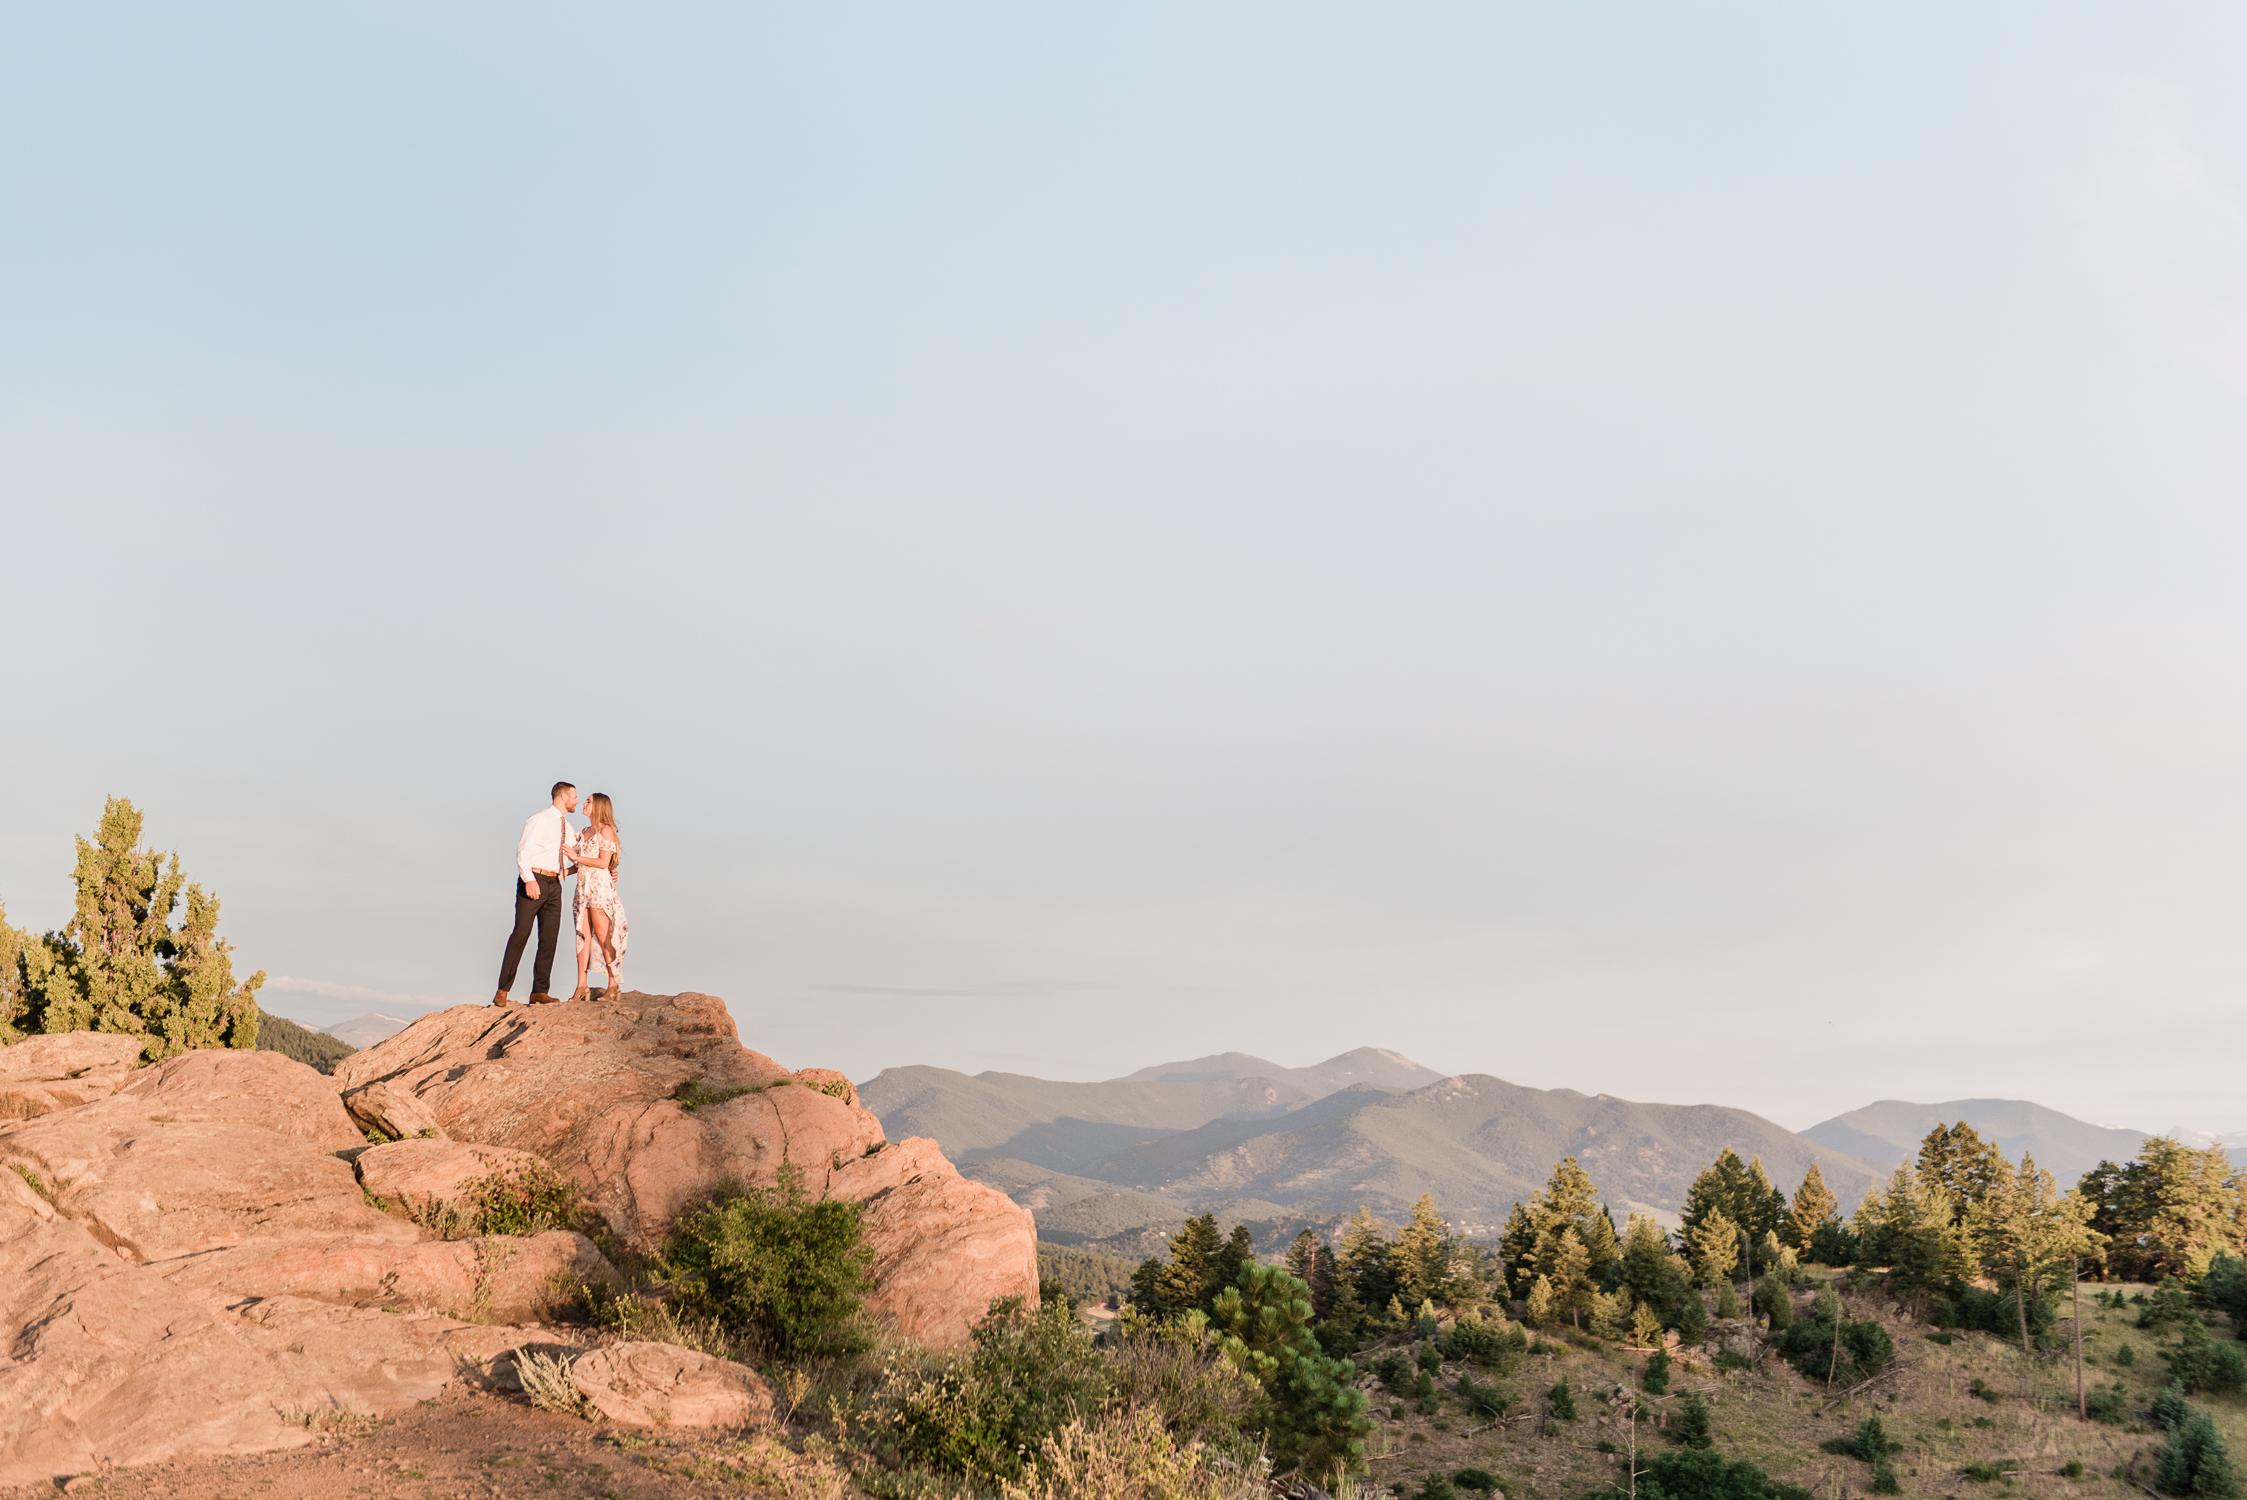 2019-08-30-Engagement-Morgan-Adam-MtFalcon-1259.jpg